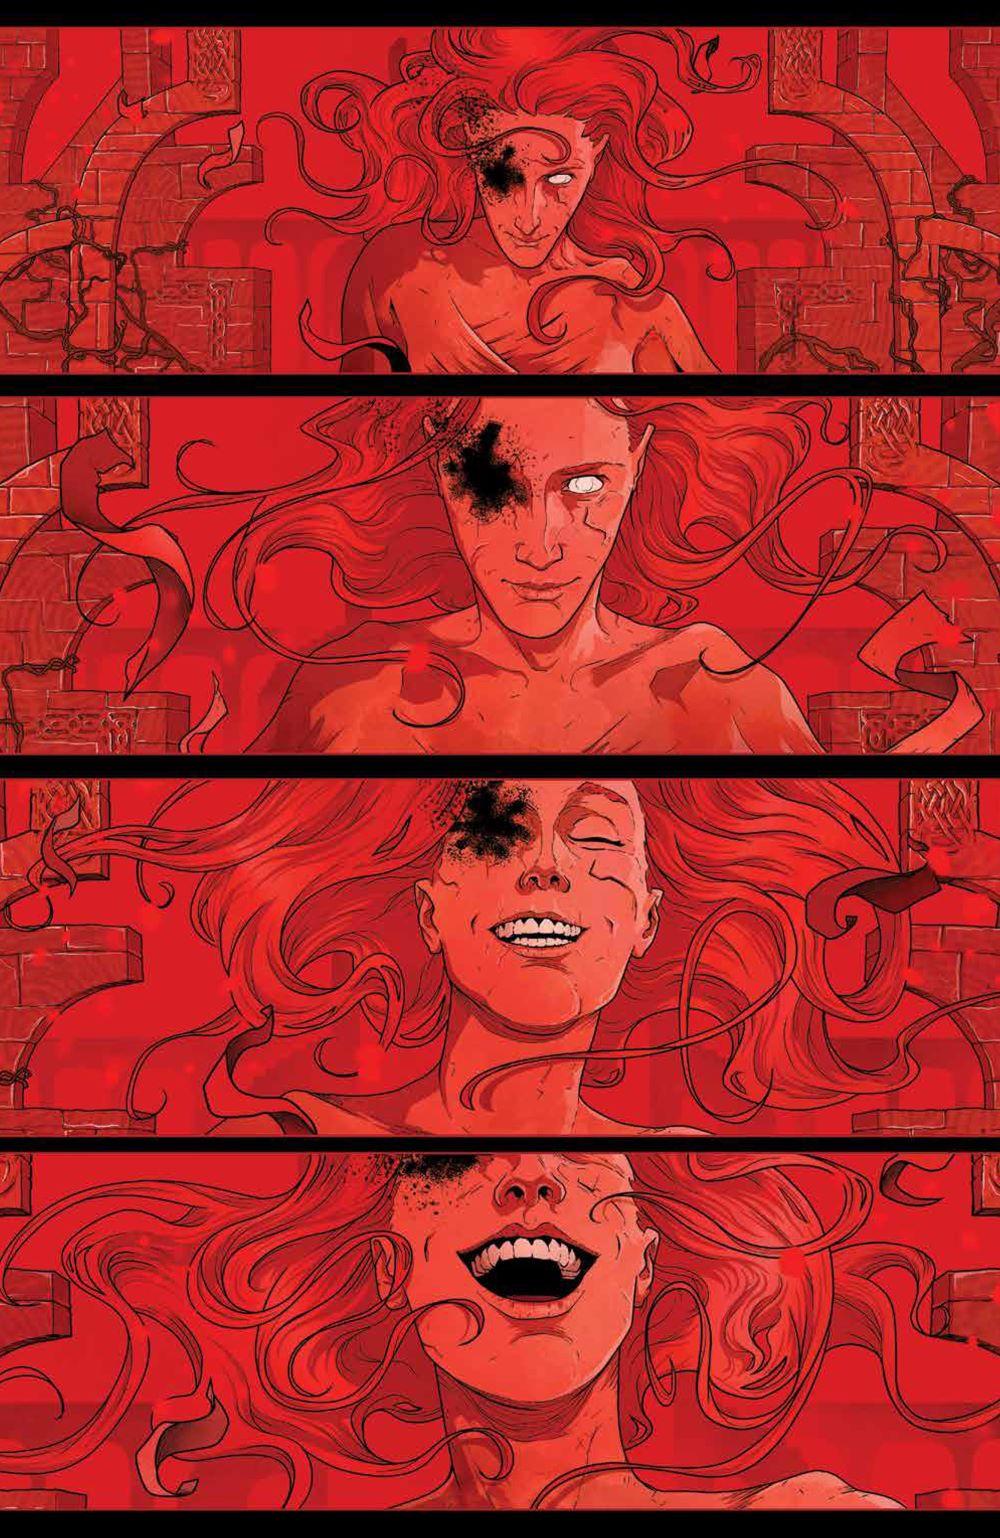 RedMother_v3_SC_PRESS_9 ComicList Previews: RED MOTHER VOLUME 3 TP